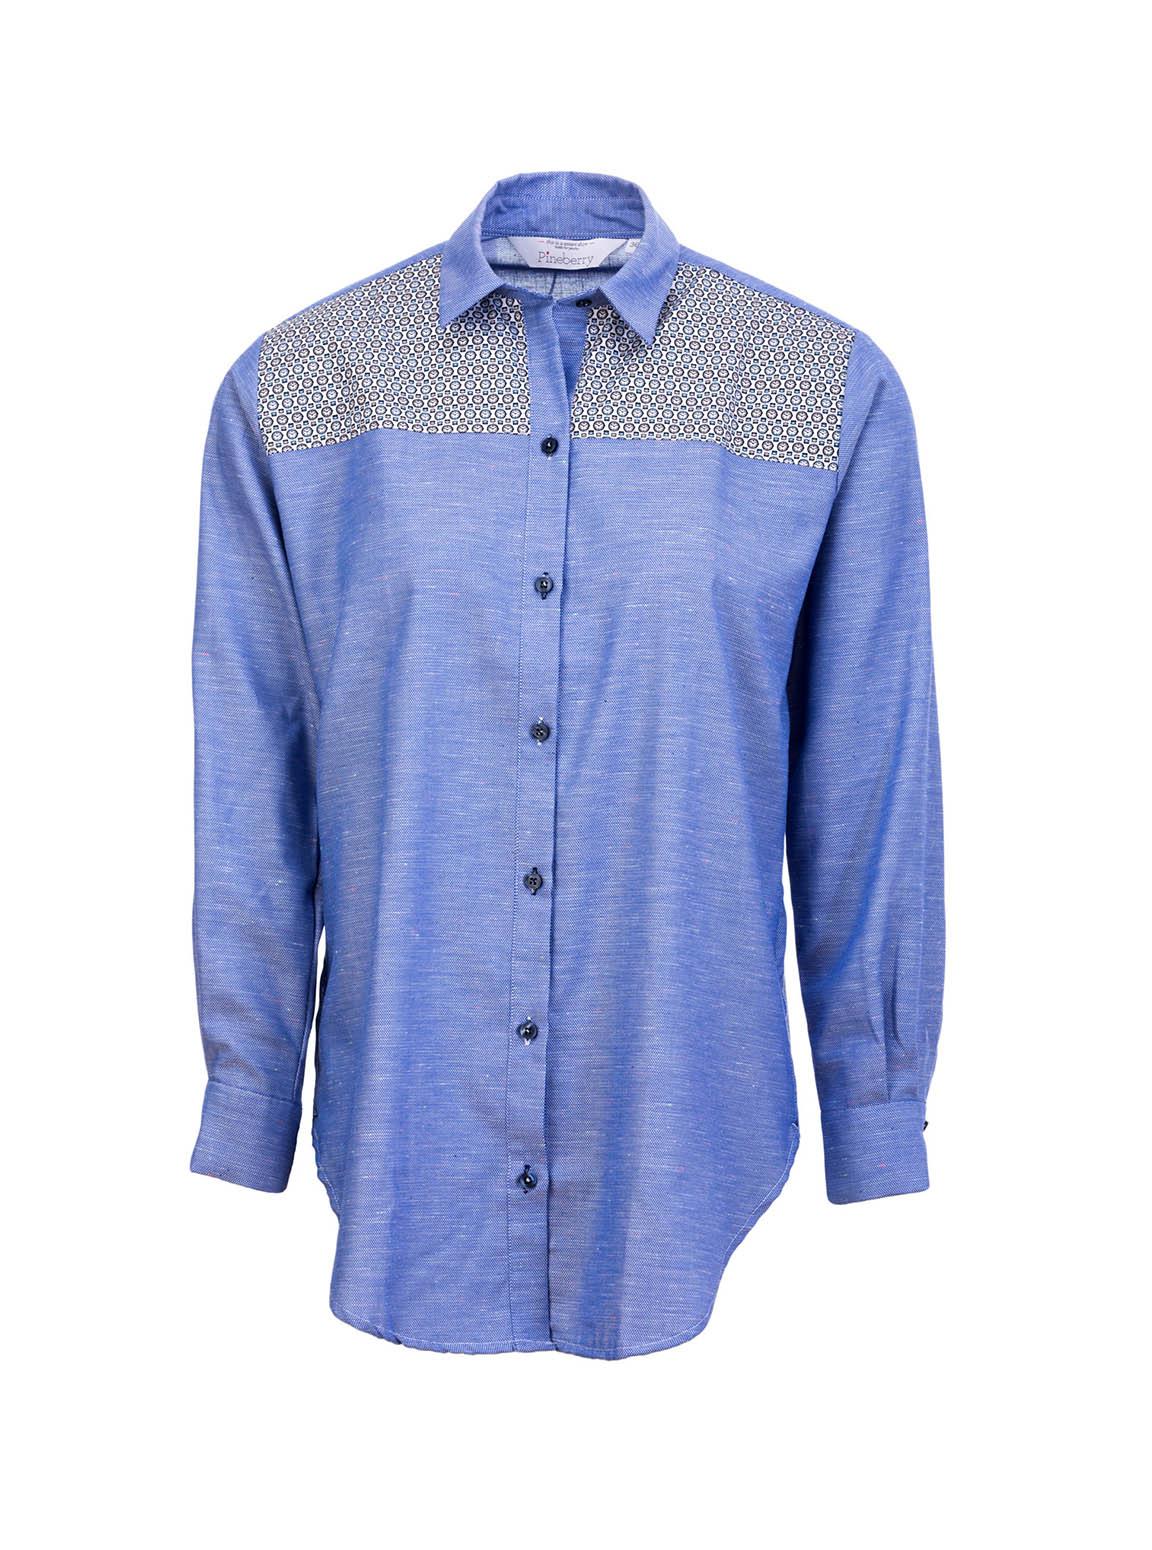 Lady Blue Time Shirt